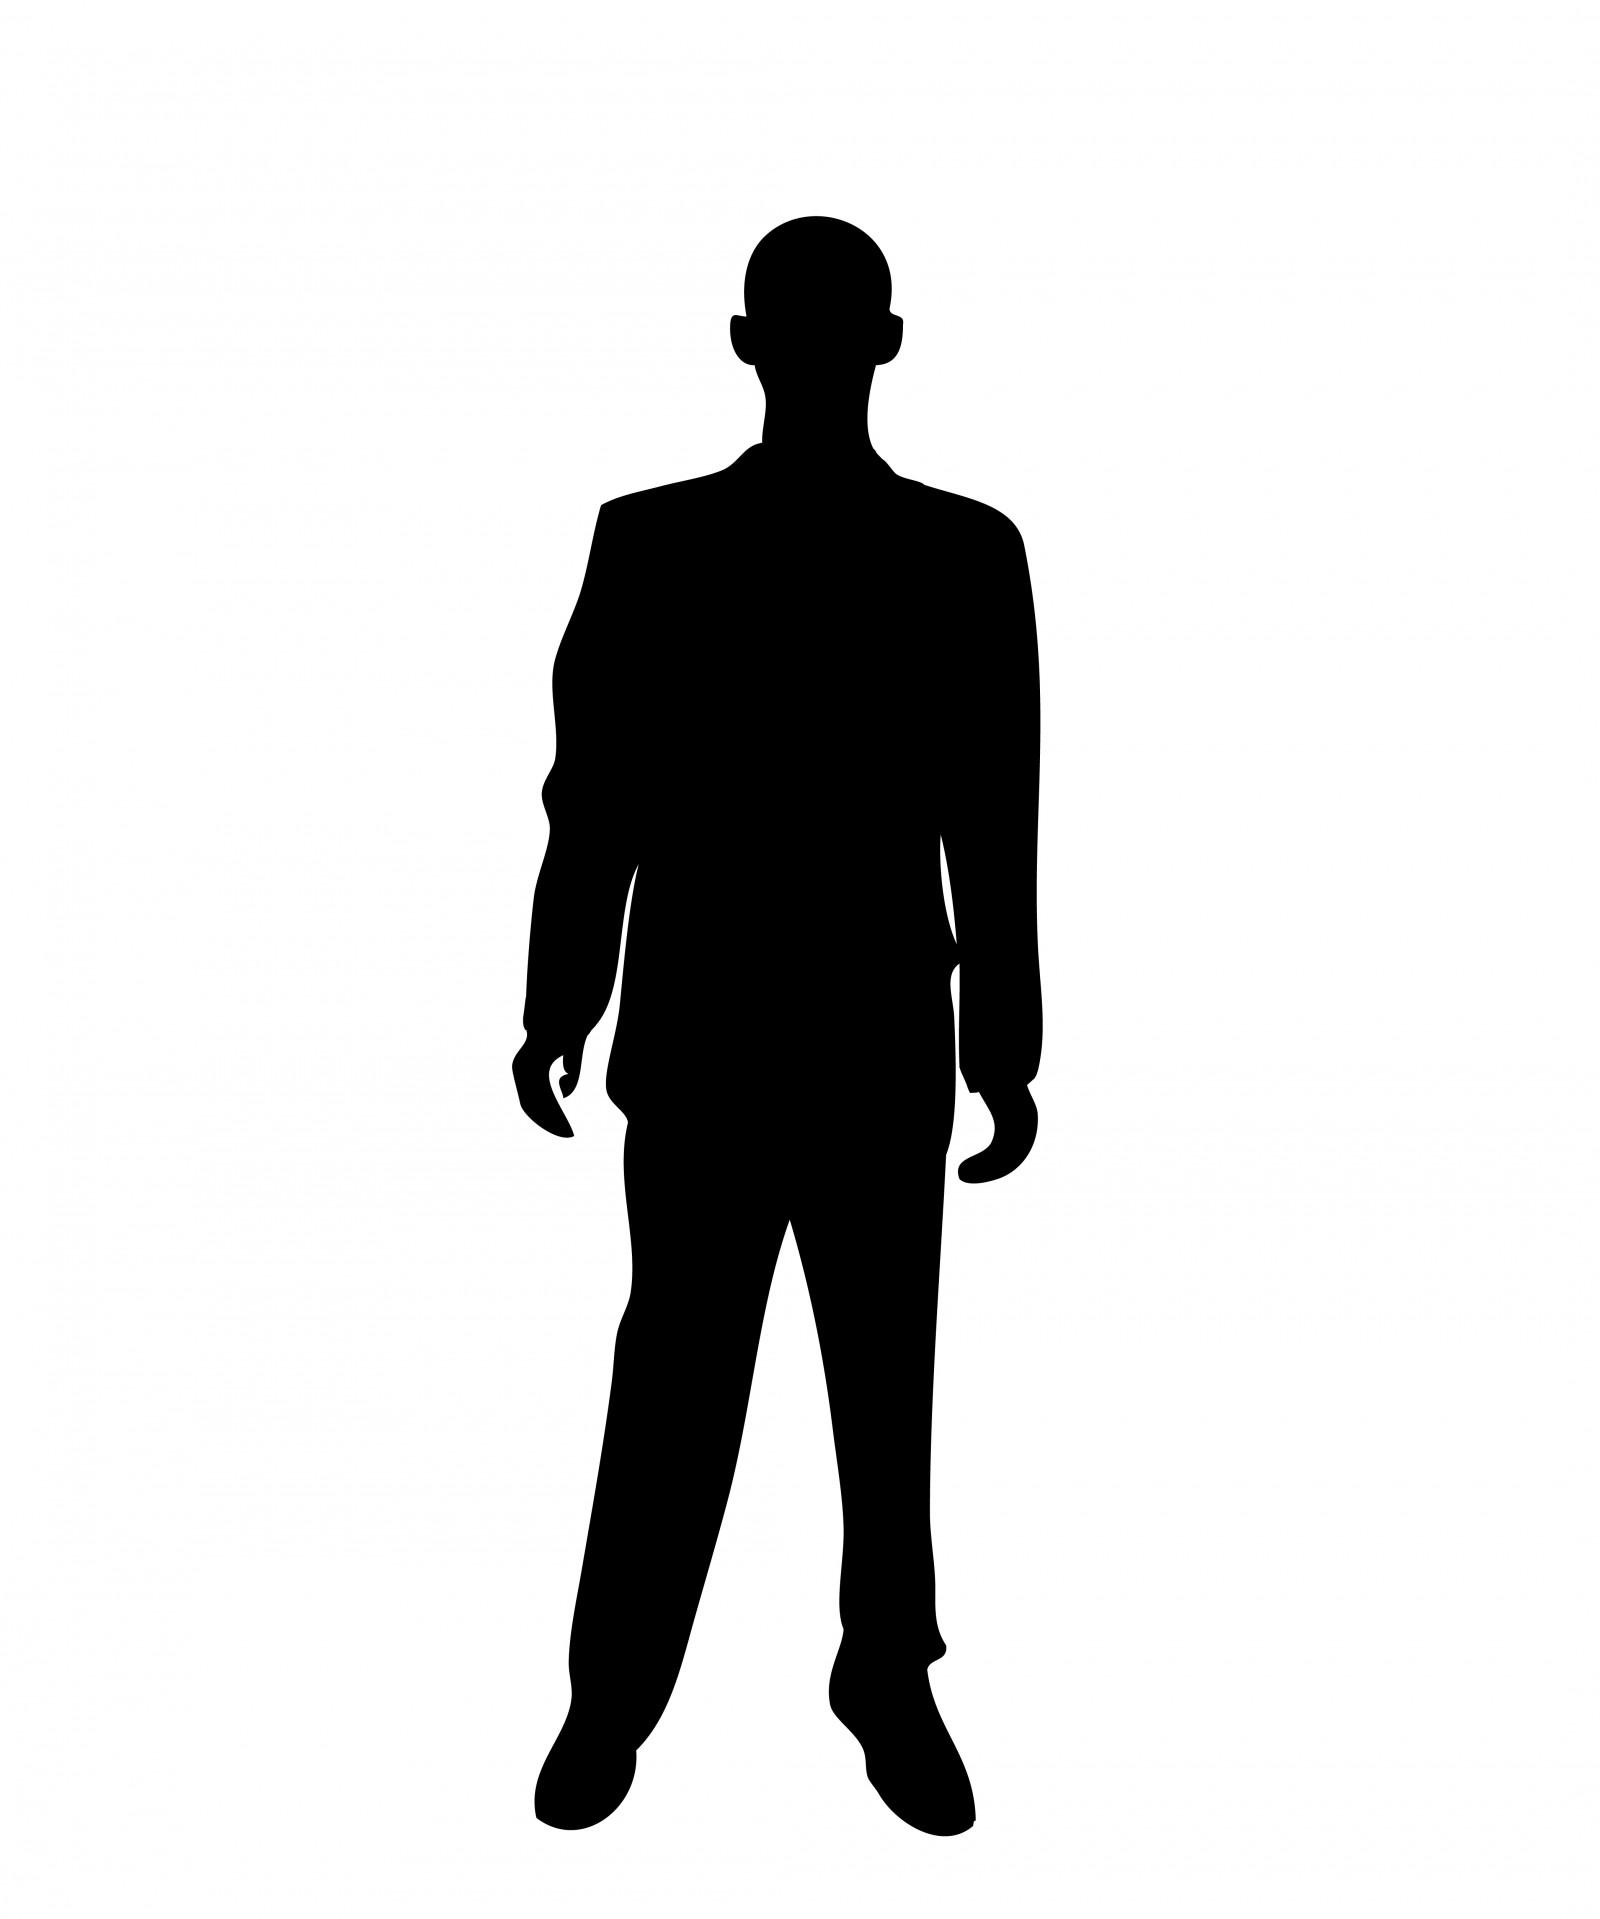 1600x1919 Business Man Black Silhouette Free Stock Photo